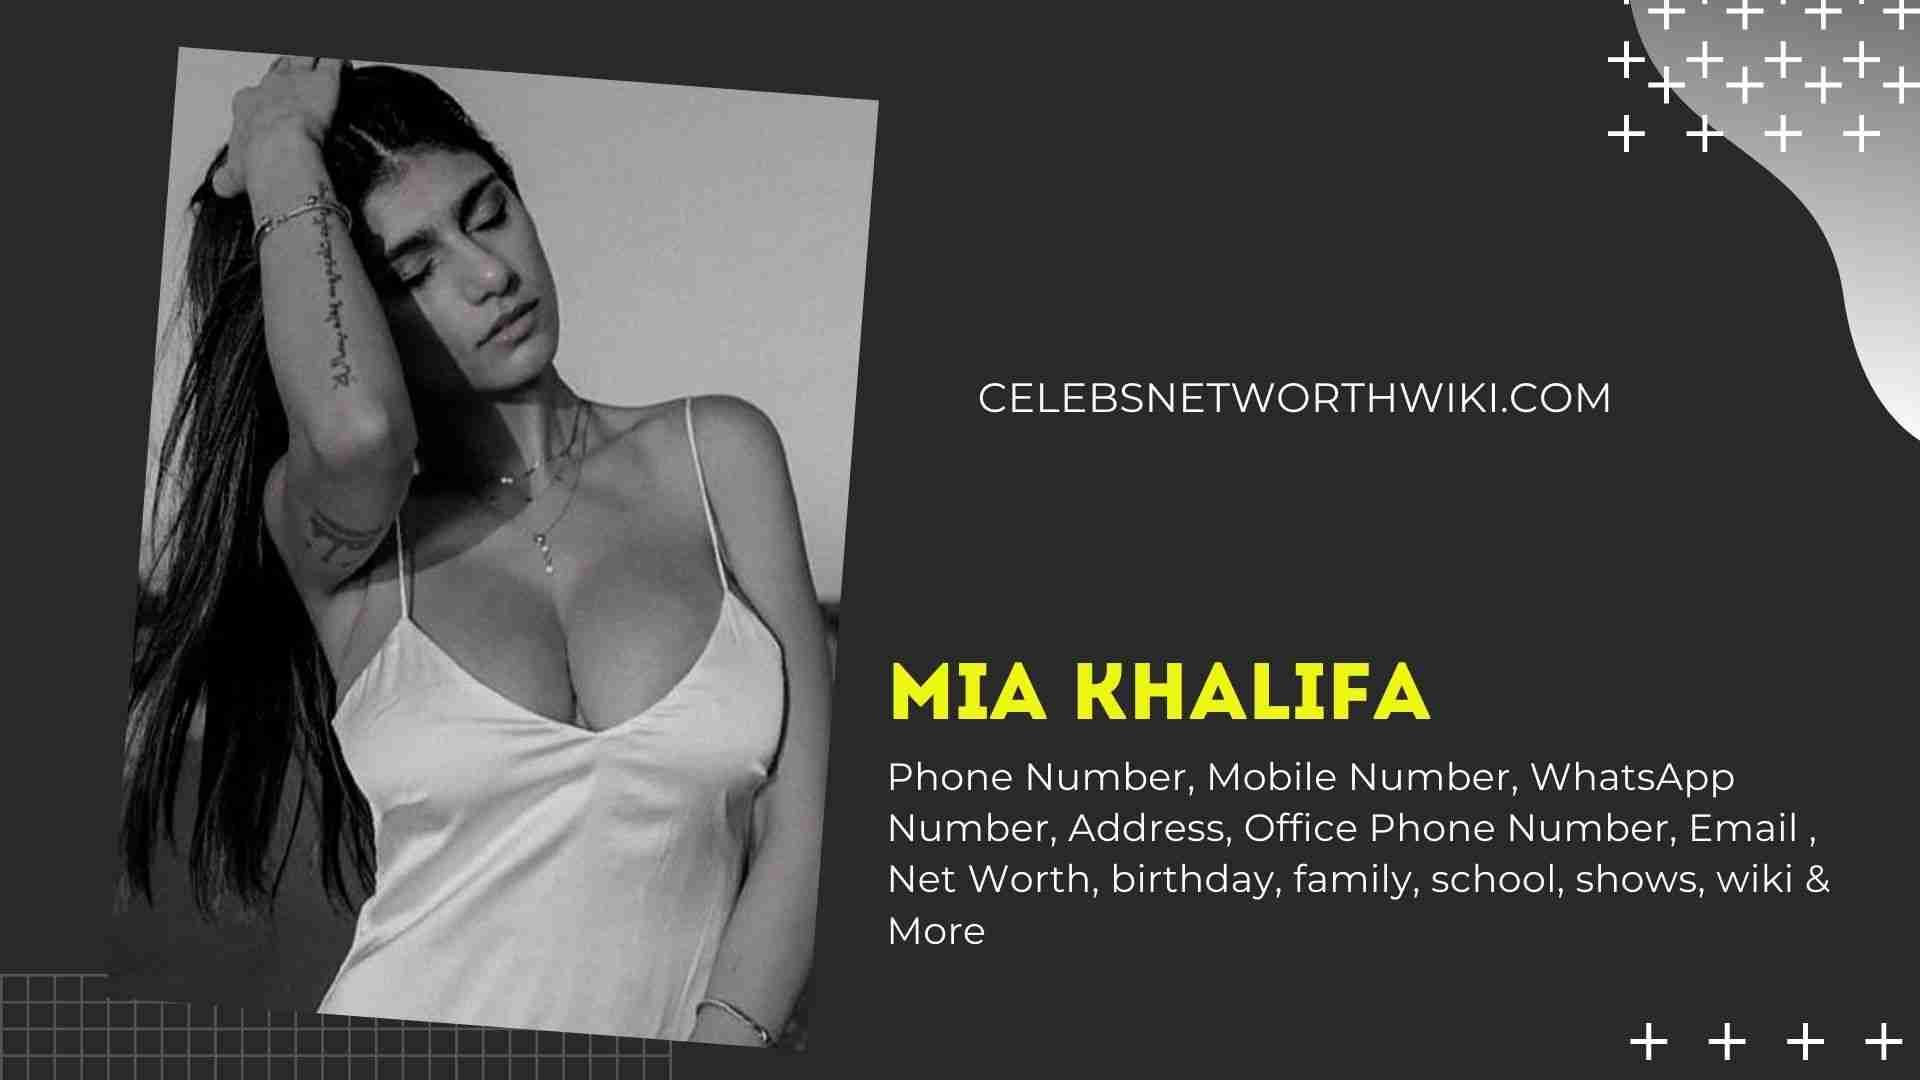 Khalifa meet mia Meet Mia